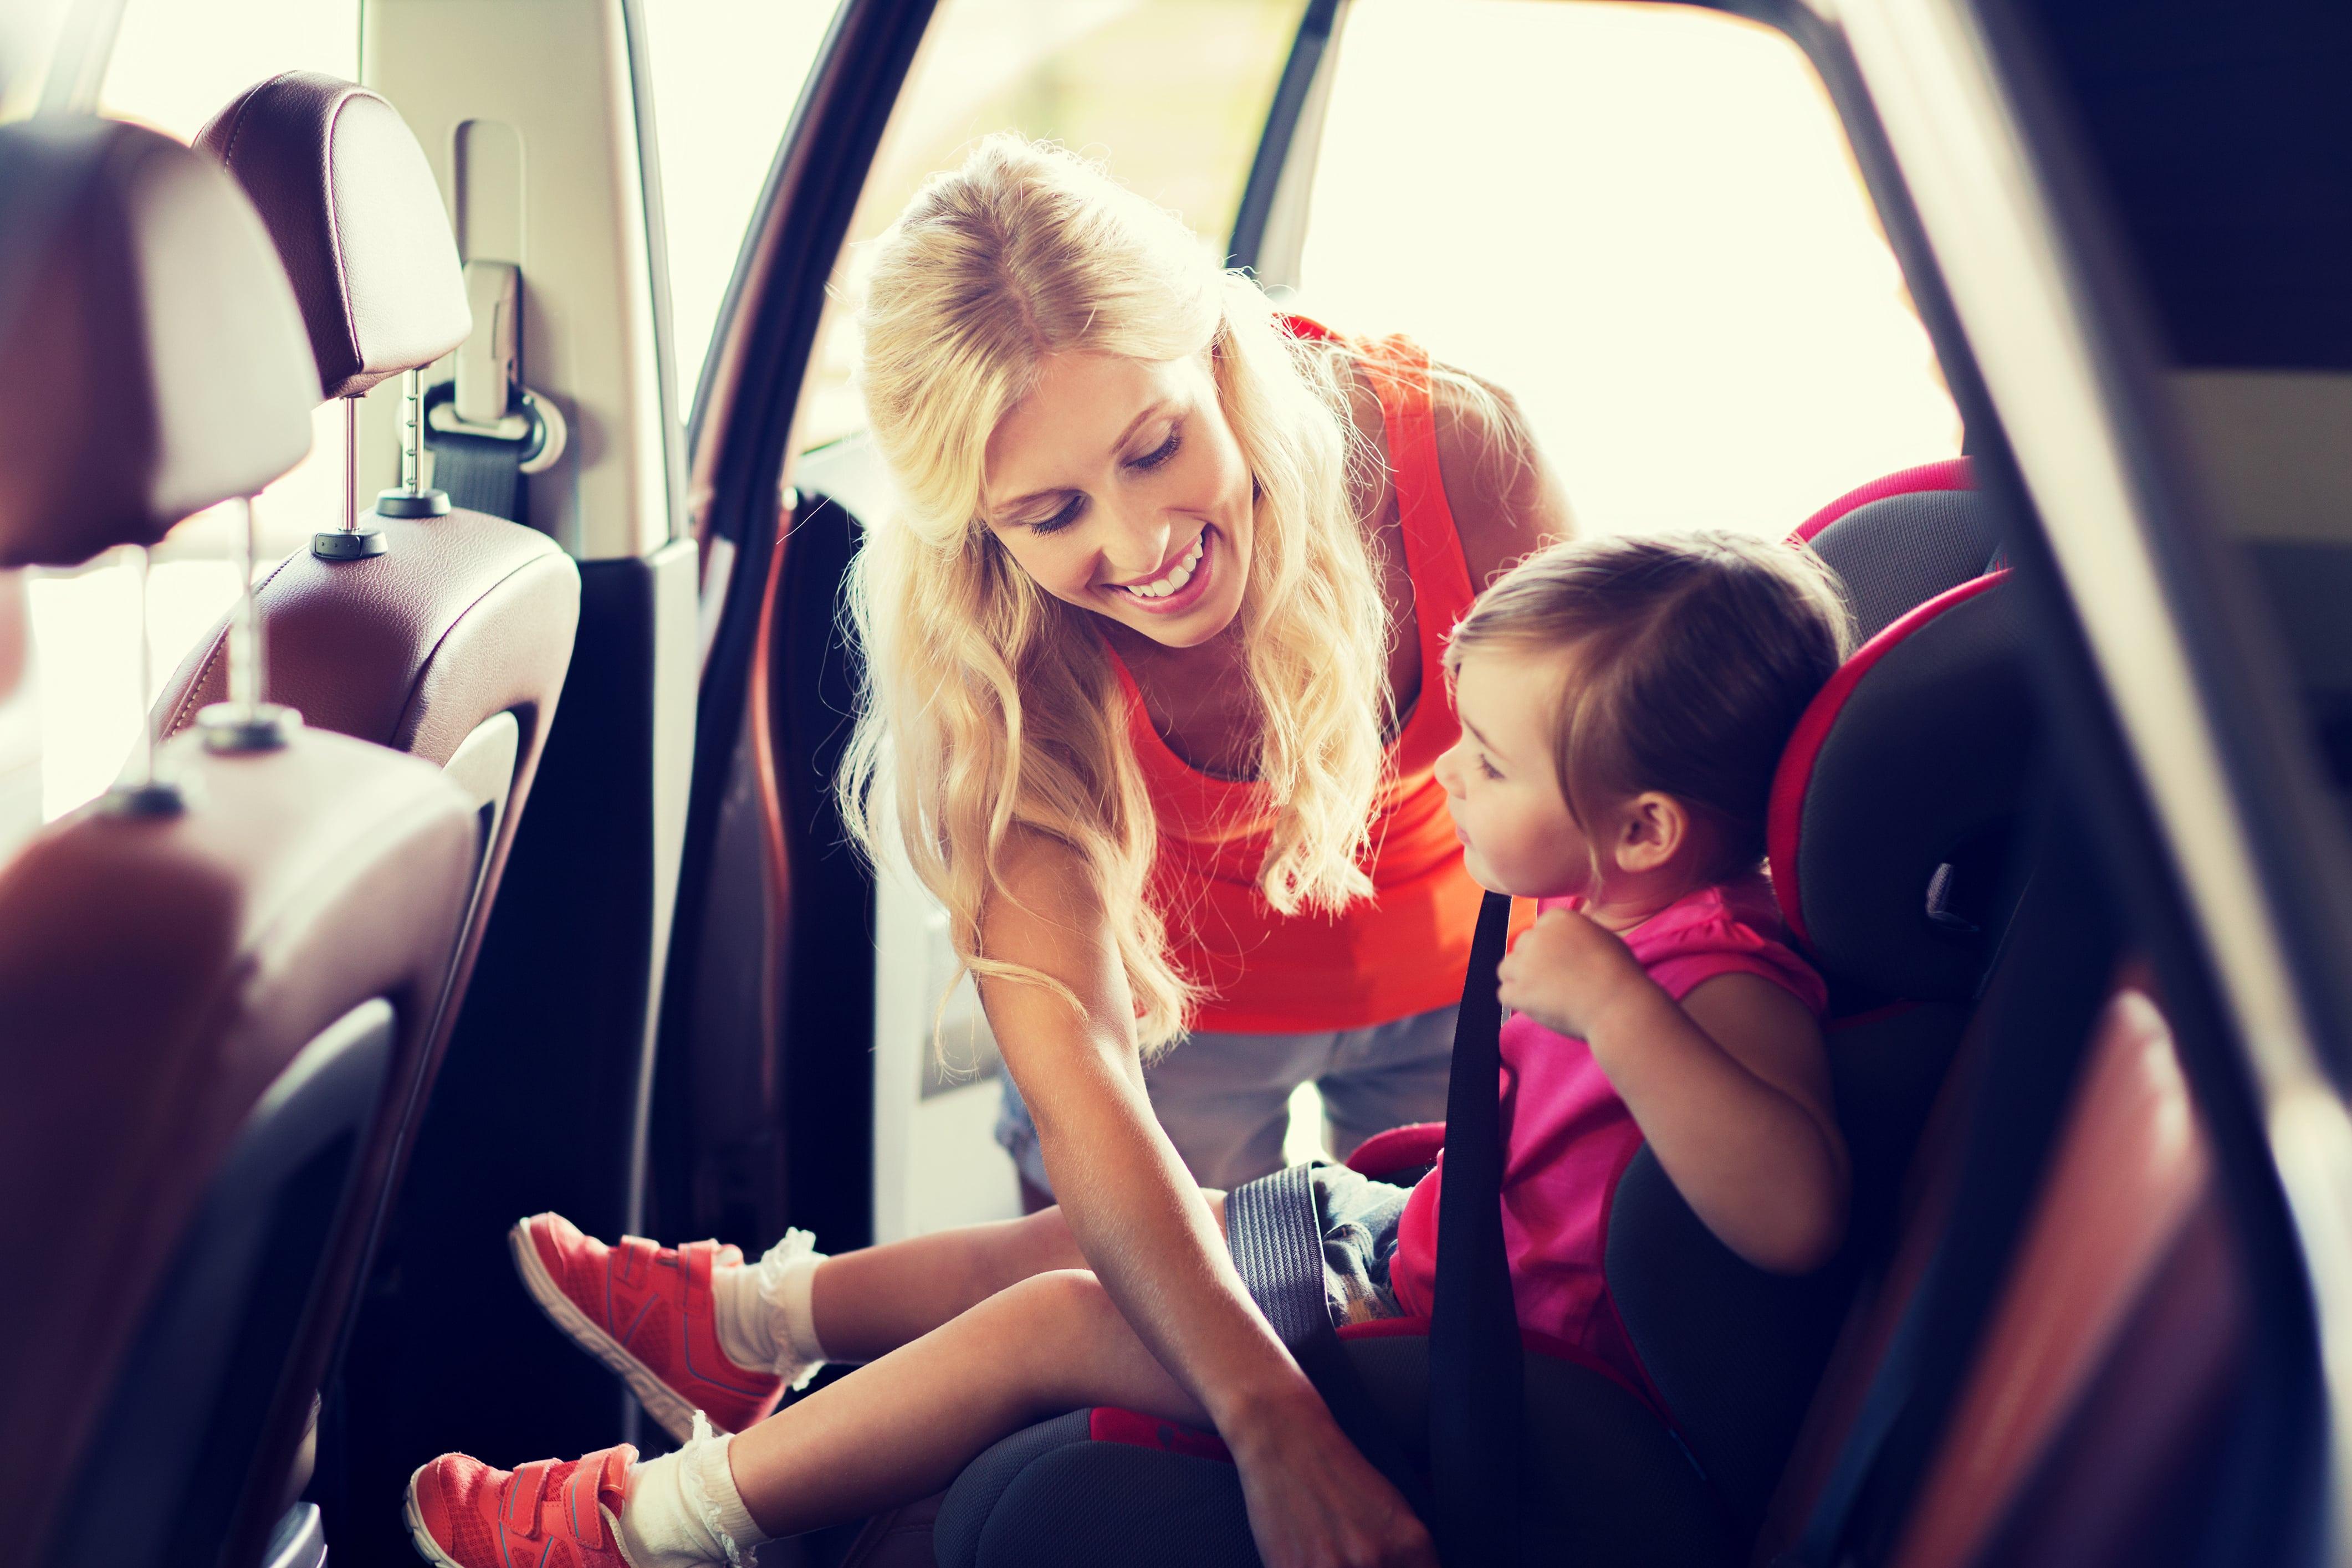 Car Seat, Car Seat Safety, Seatbelt